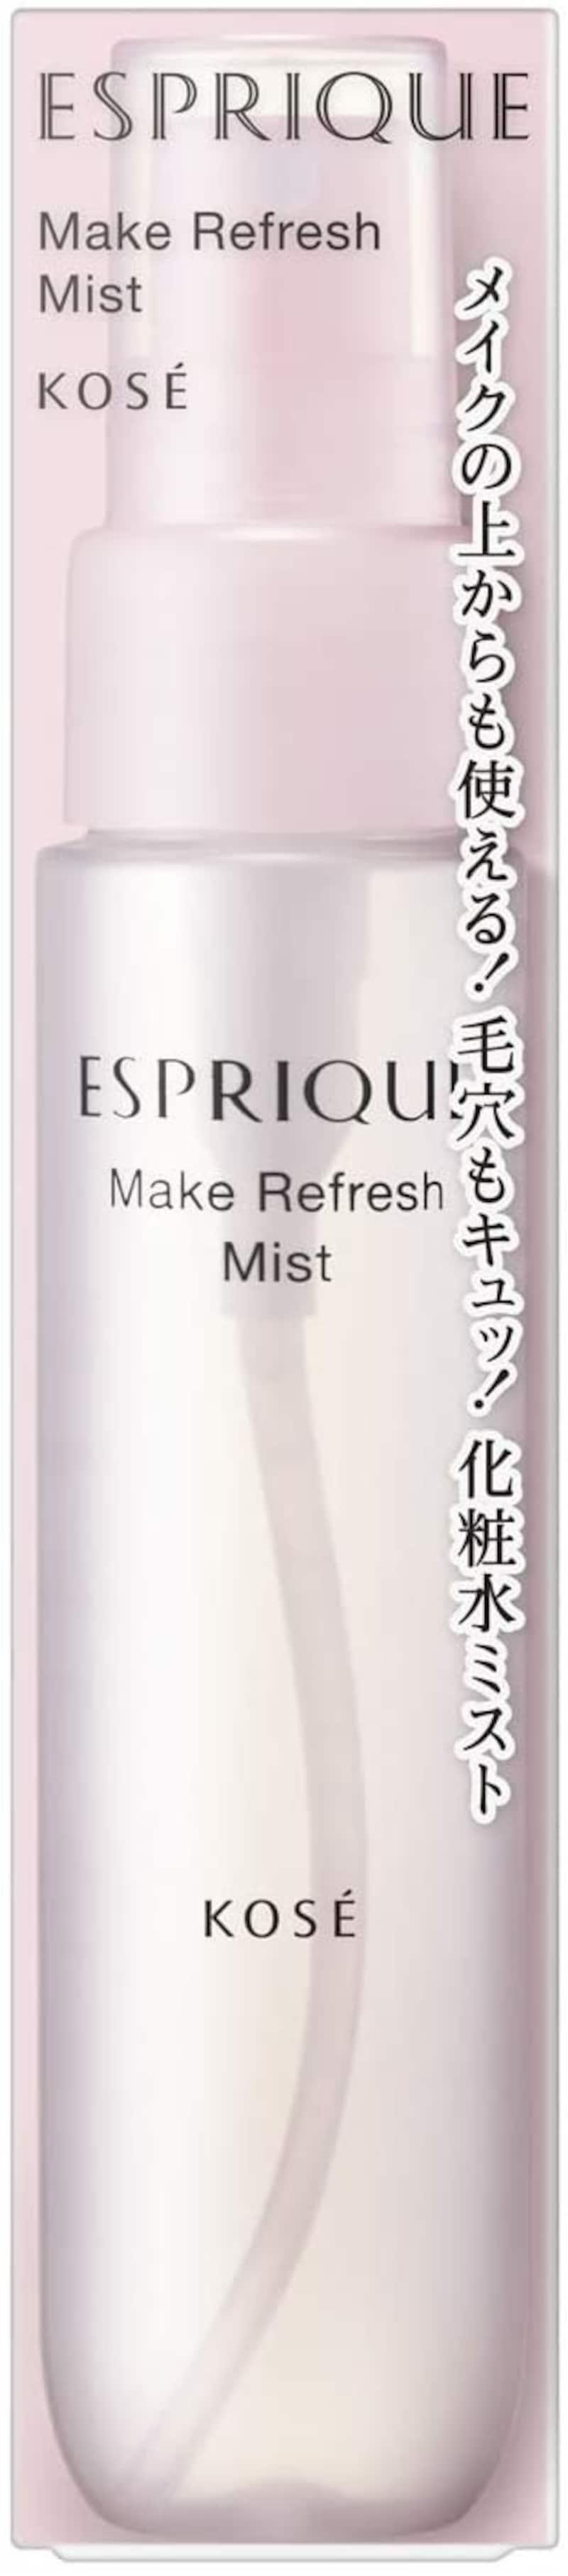 ESPRIQUE(エスプリーク),メイクリフレッシュミスト